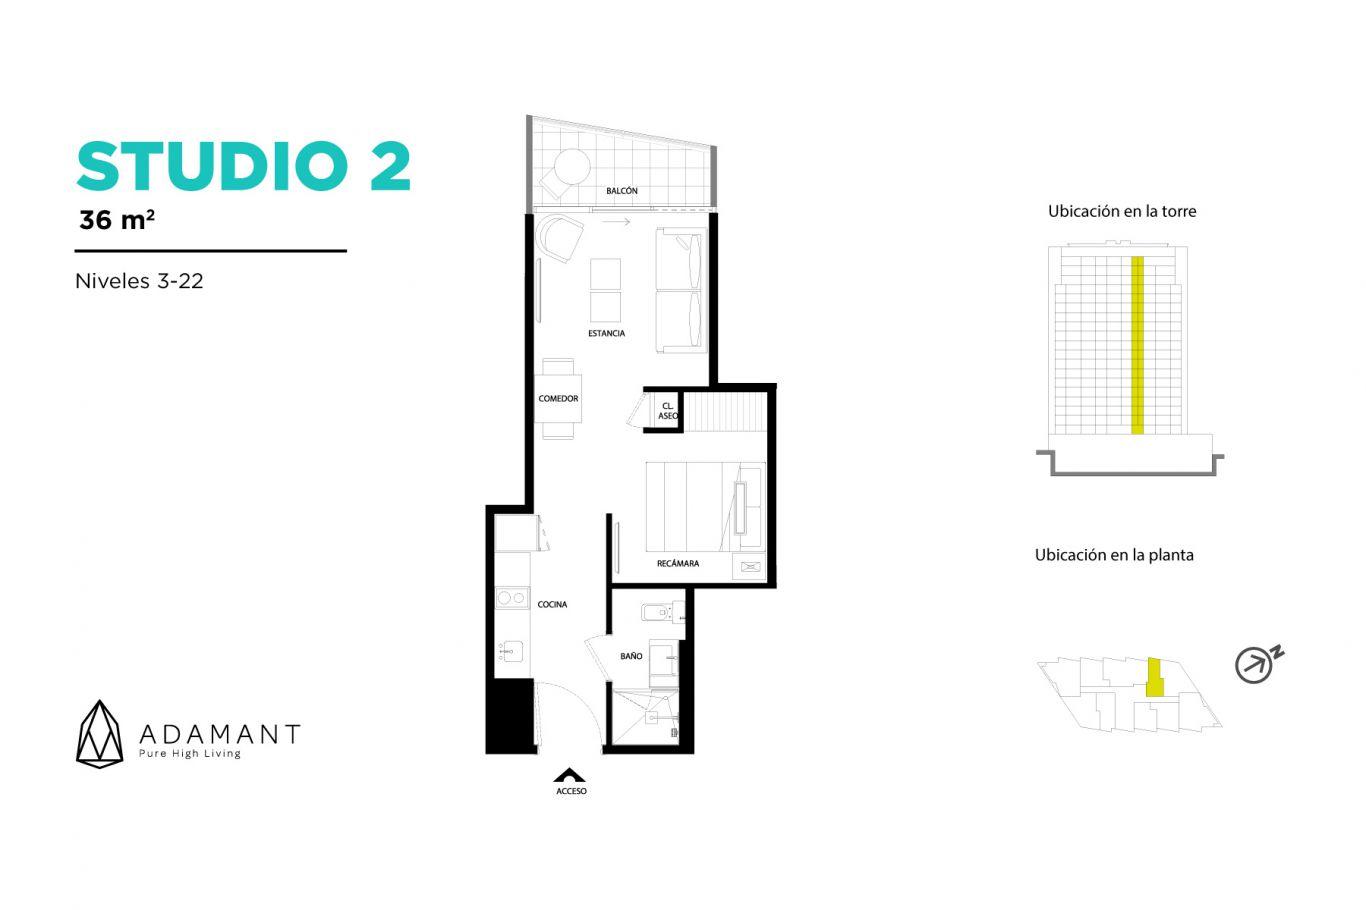 Adamant tijuana, id 1656034, no 1, plano de studio 2, 522